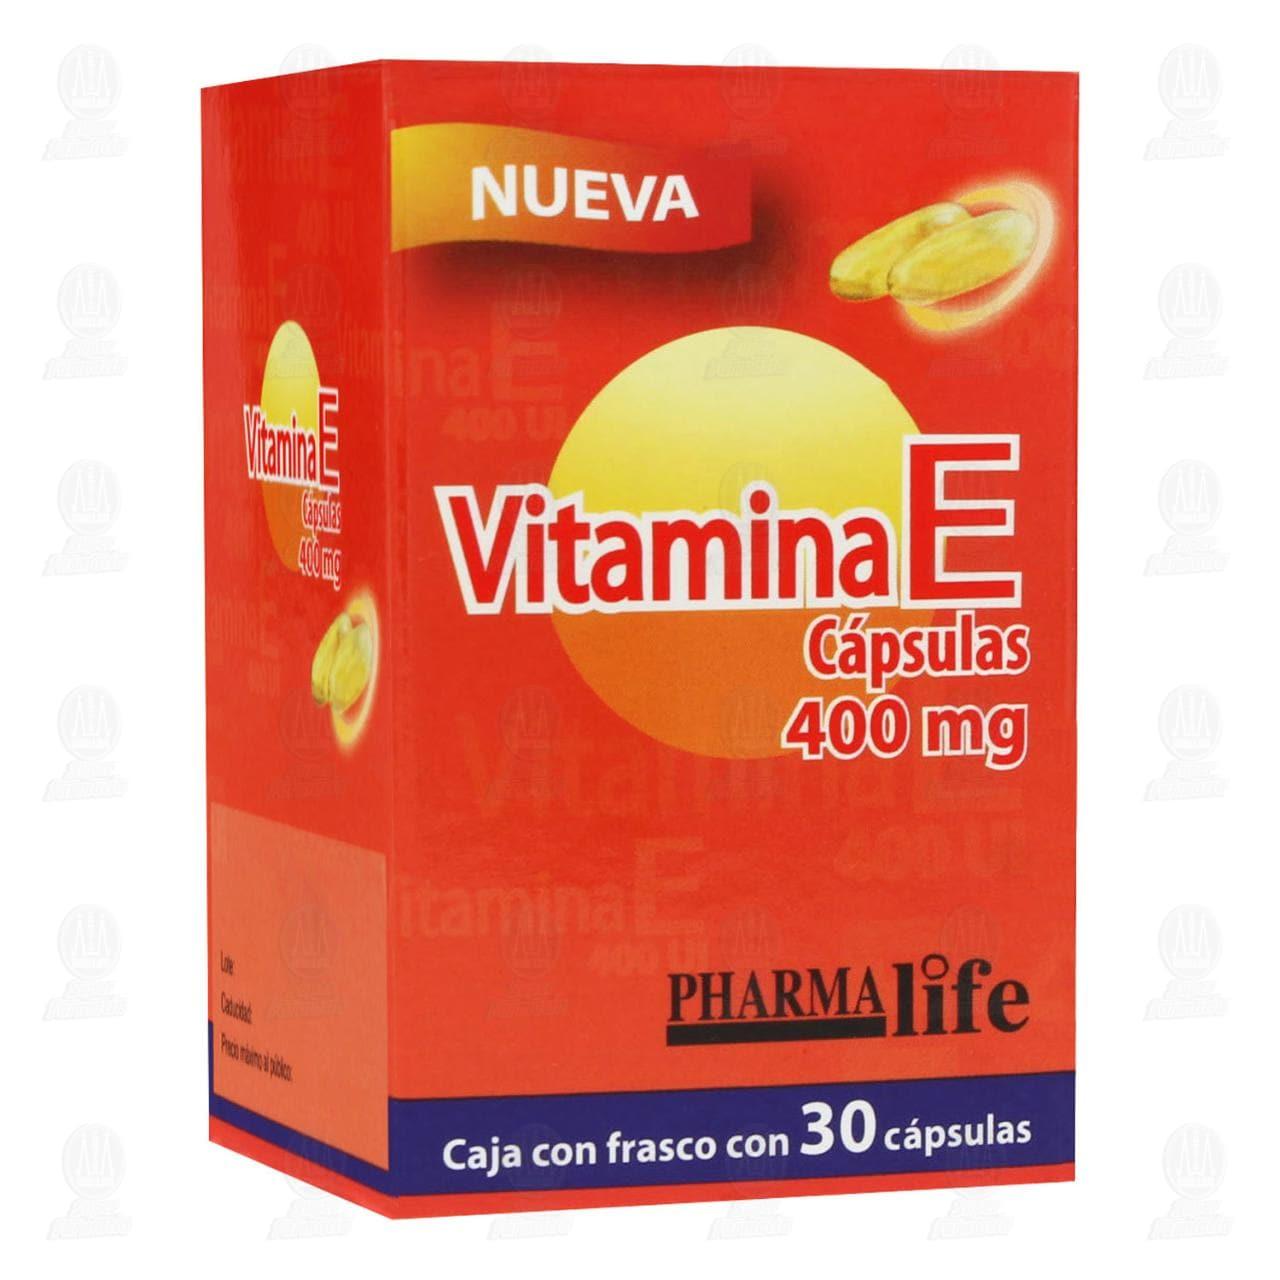 Comprar Vitamina E 400mg 30 Cápsulas Pharmalife en Farmacias Guadalajara